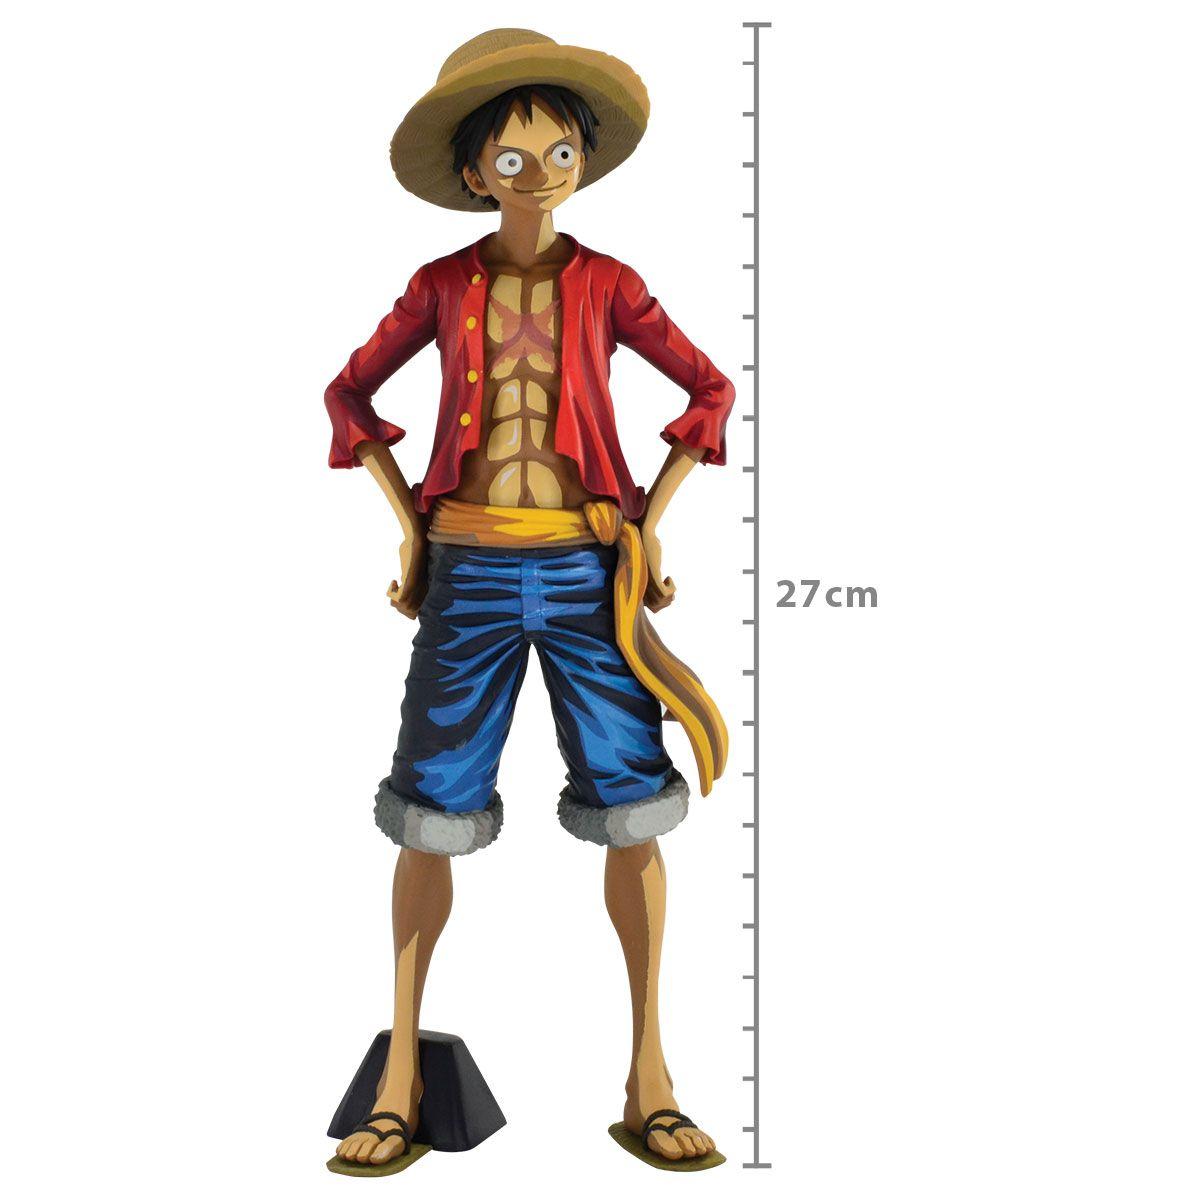 One Piece - Monkey D. Luffy - Grandista - Manga Dimensions - Bandai Banpresto